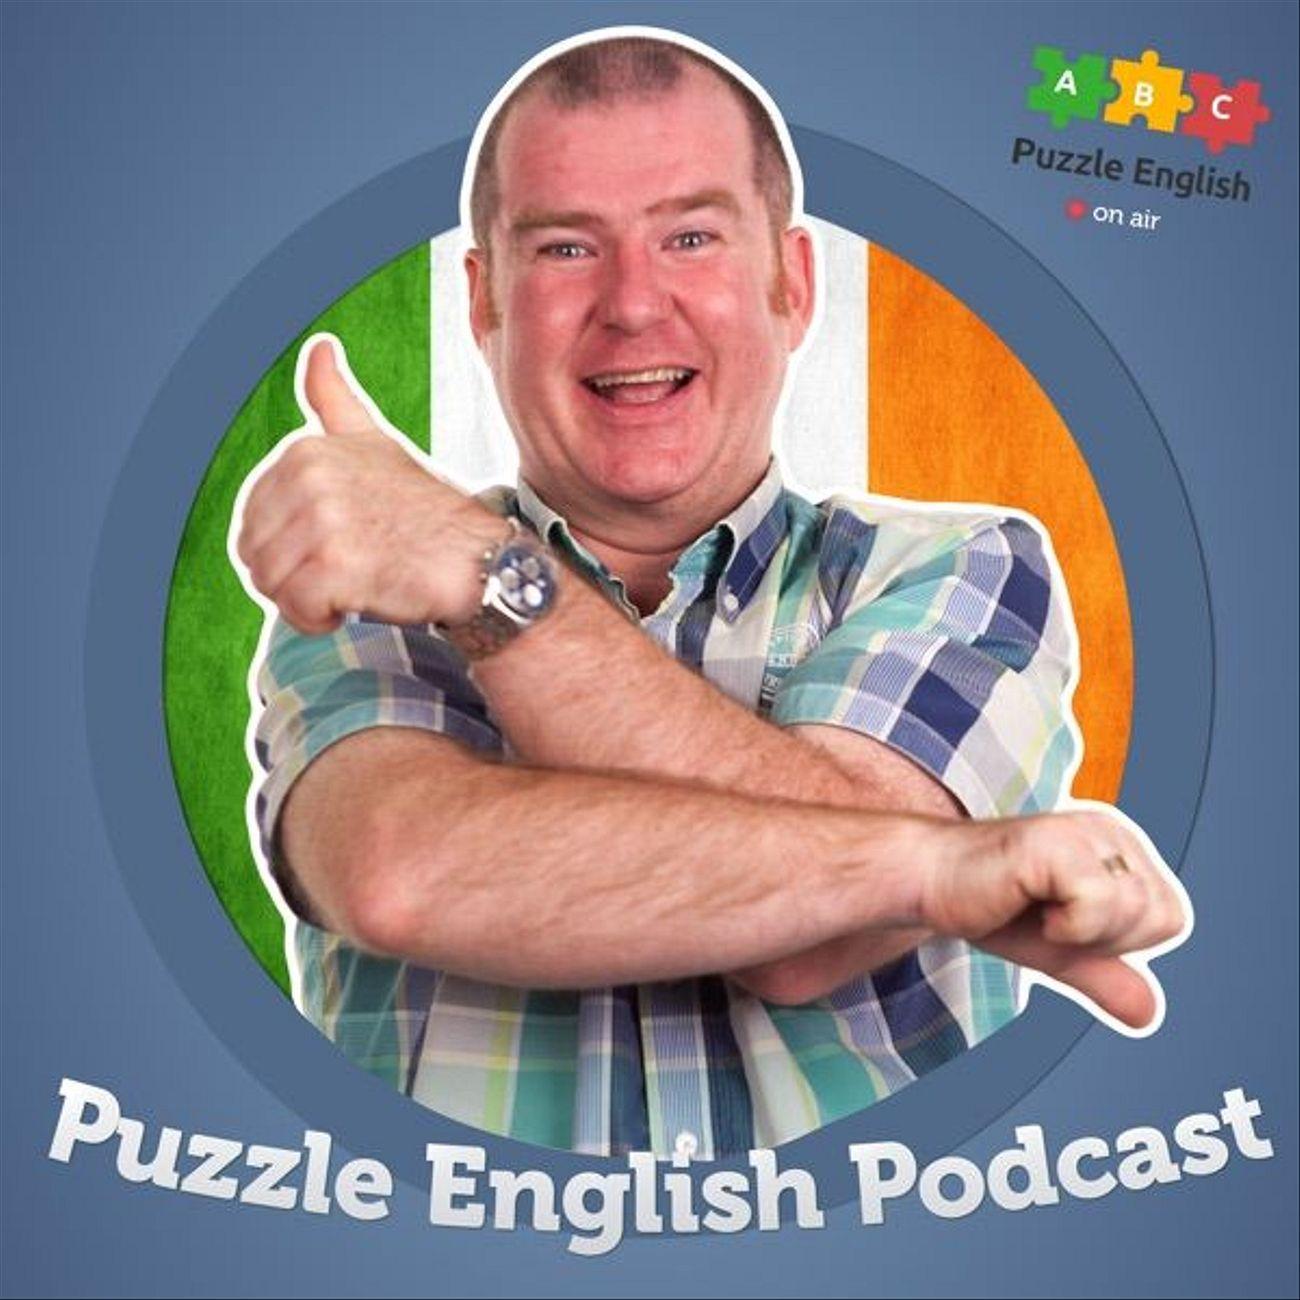 Puzzle English Podcast